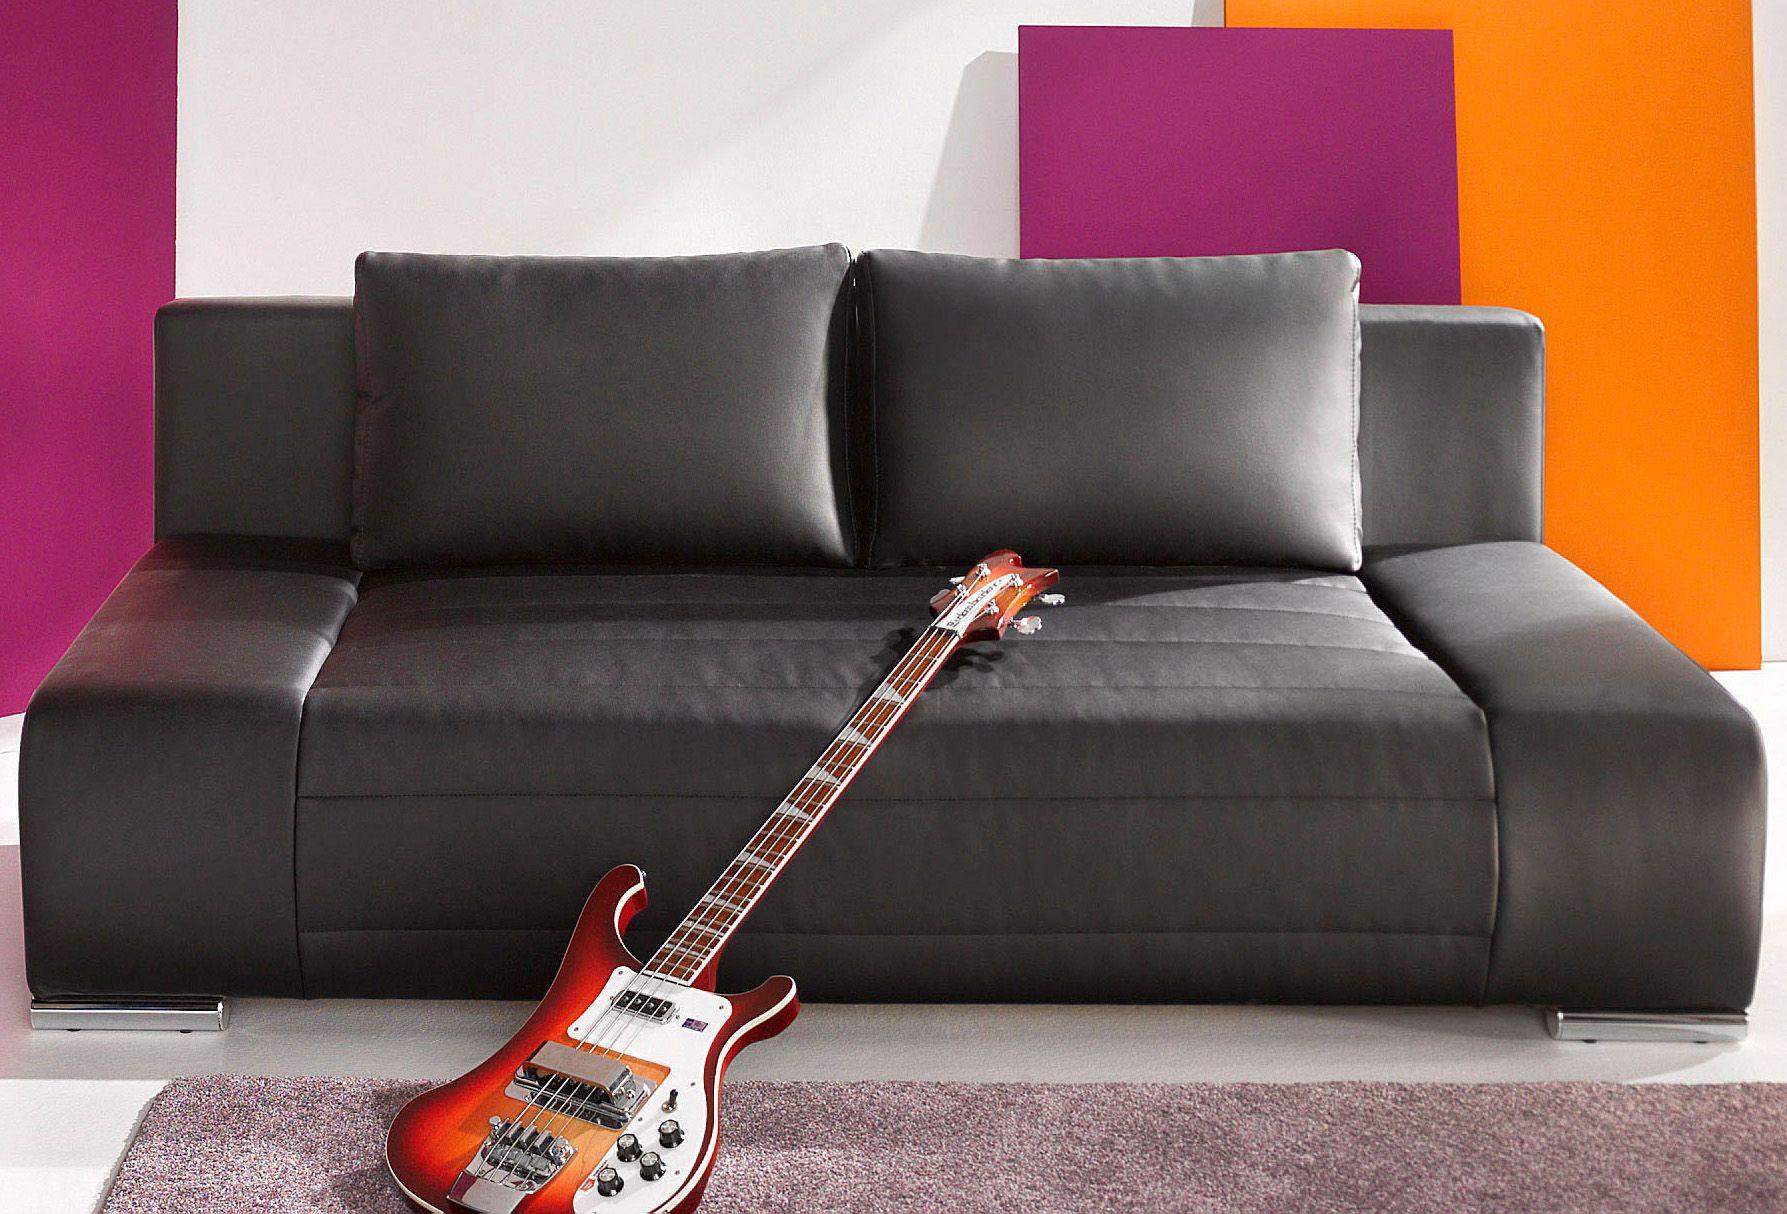 schlafsofa inosign schwab versand schlafsofas. Black Bedroom Furniture Sets. Home Design Ideas